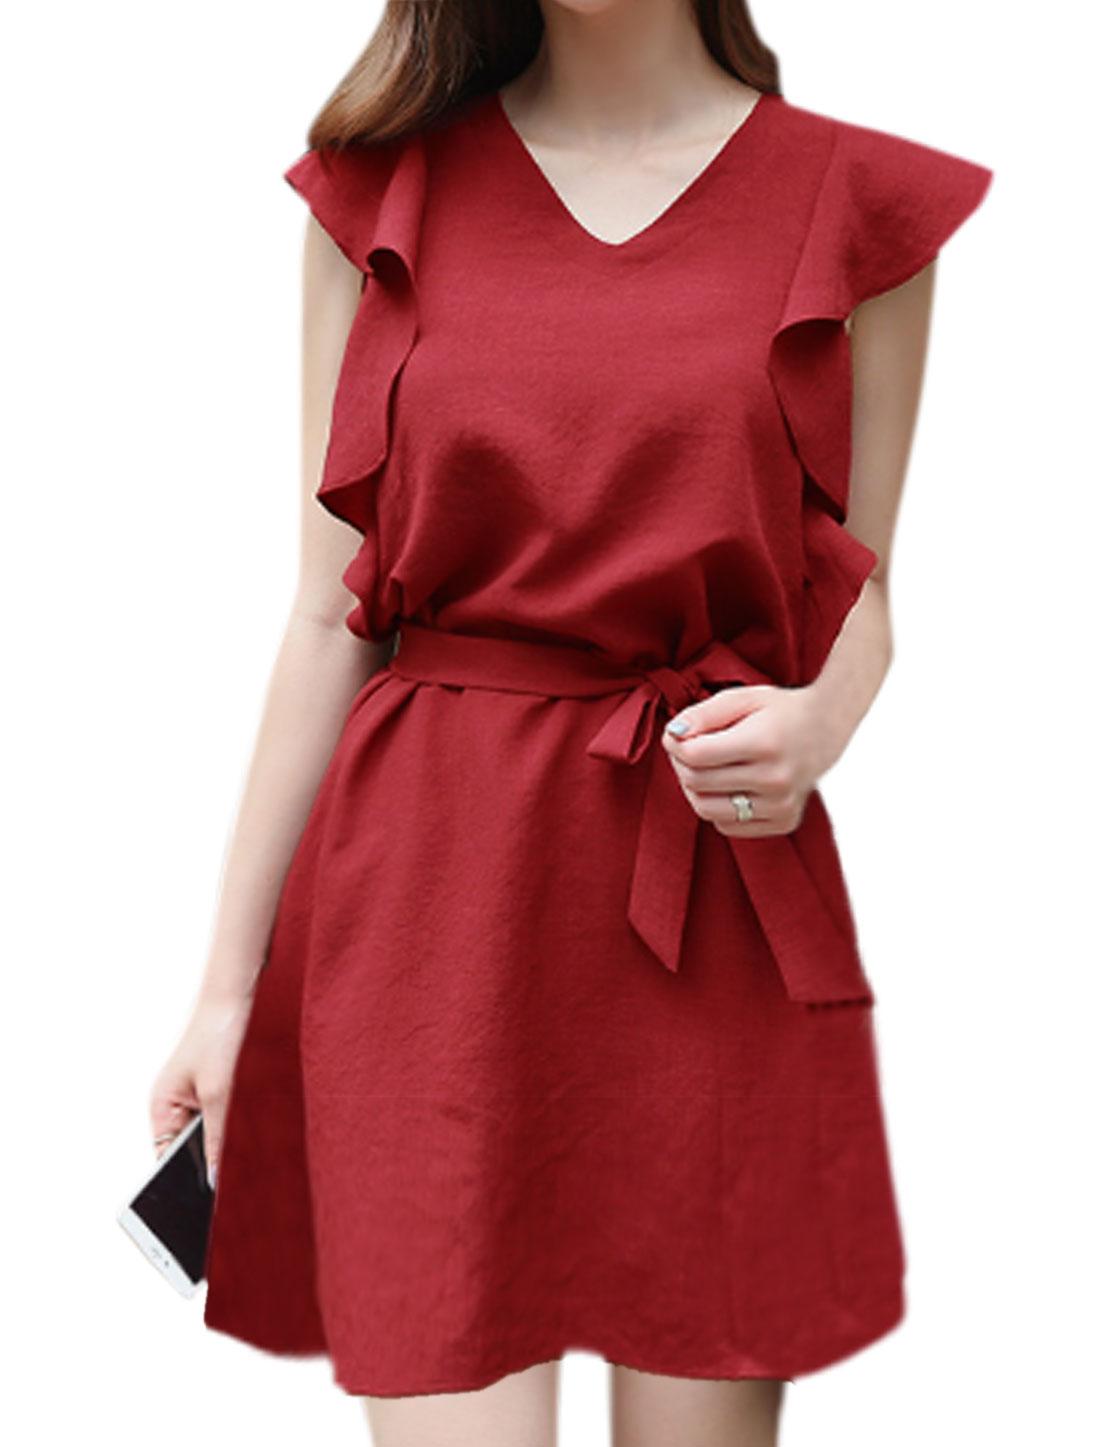 Women Butterfly Sleeves V Neck Self Tie Belt Tunic Dress Red S